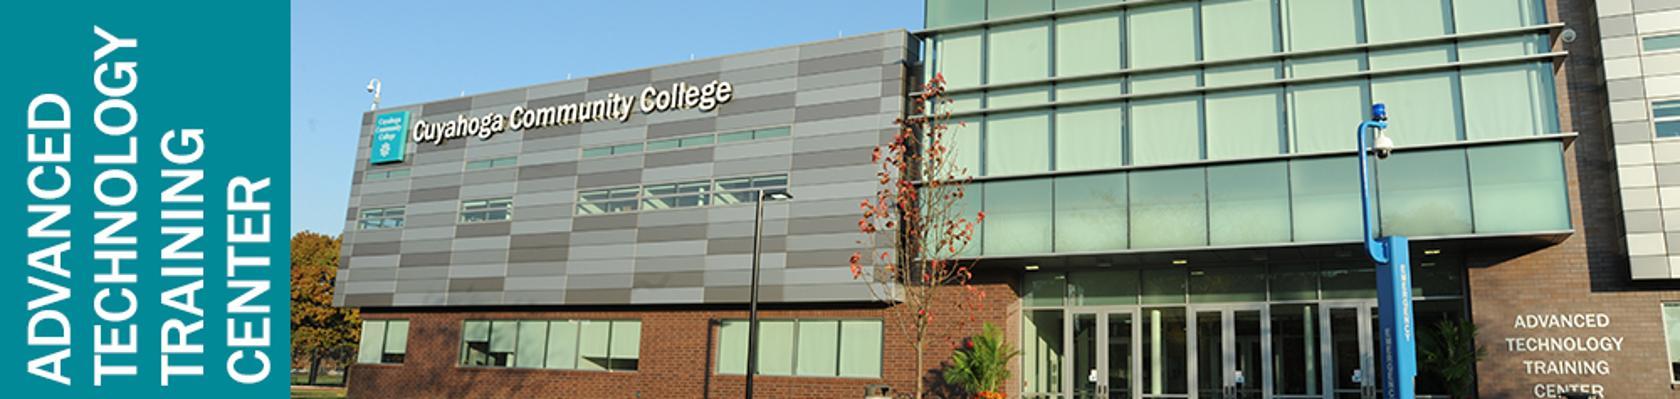 Tri-C Advanced Technology Training Center, ATTC: Cleveland Ohio